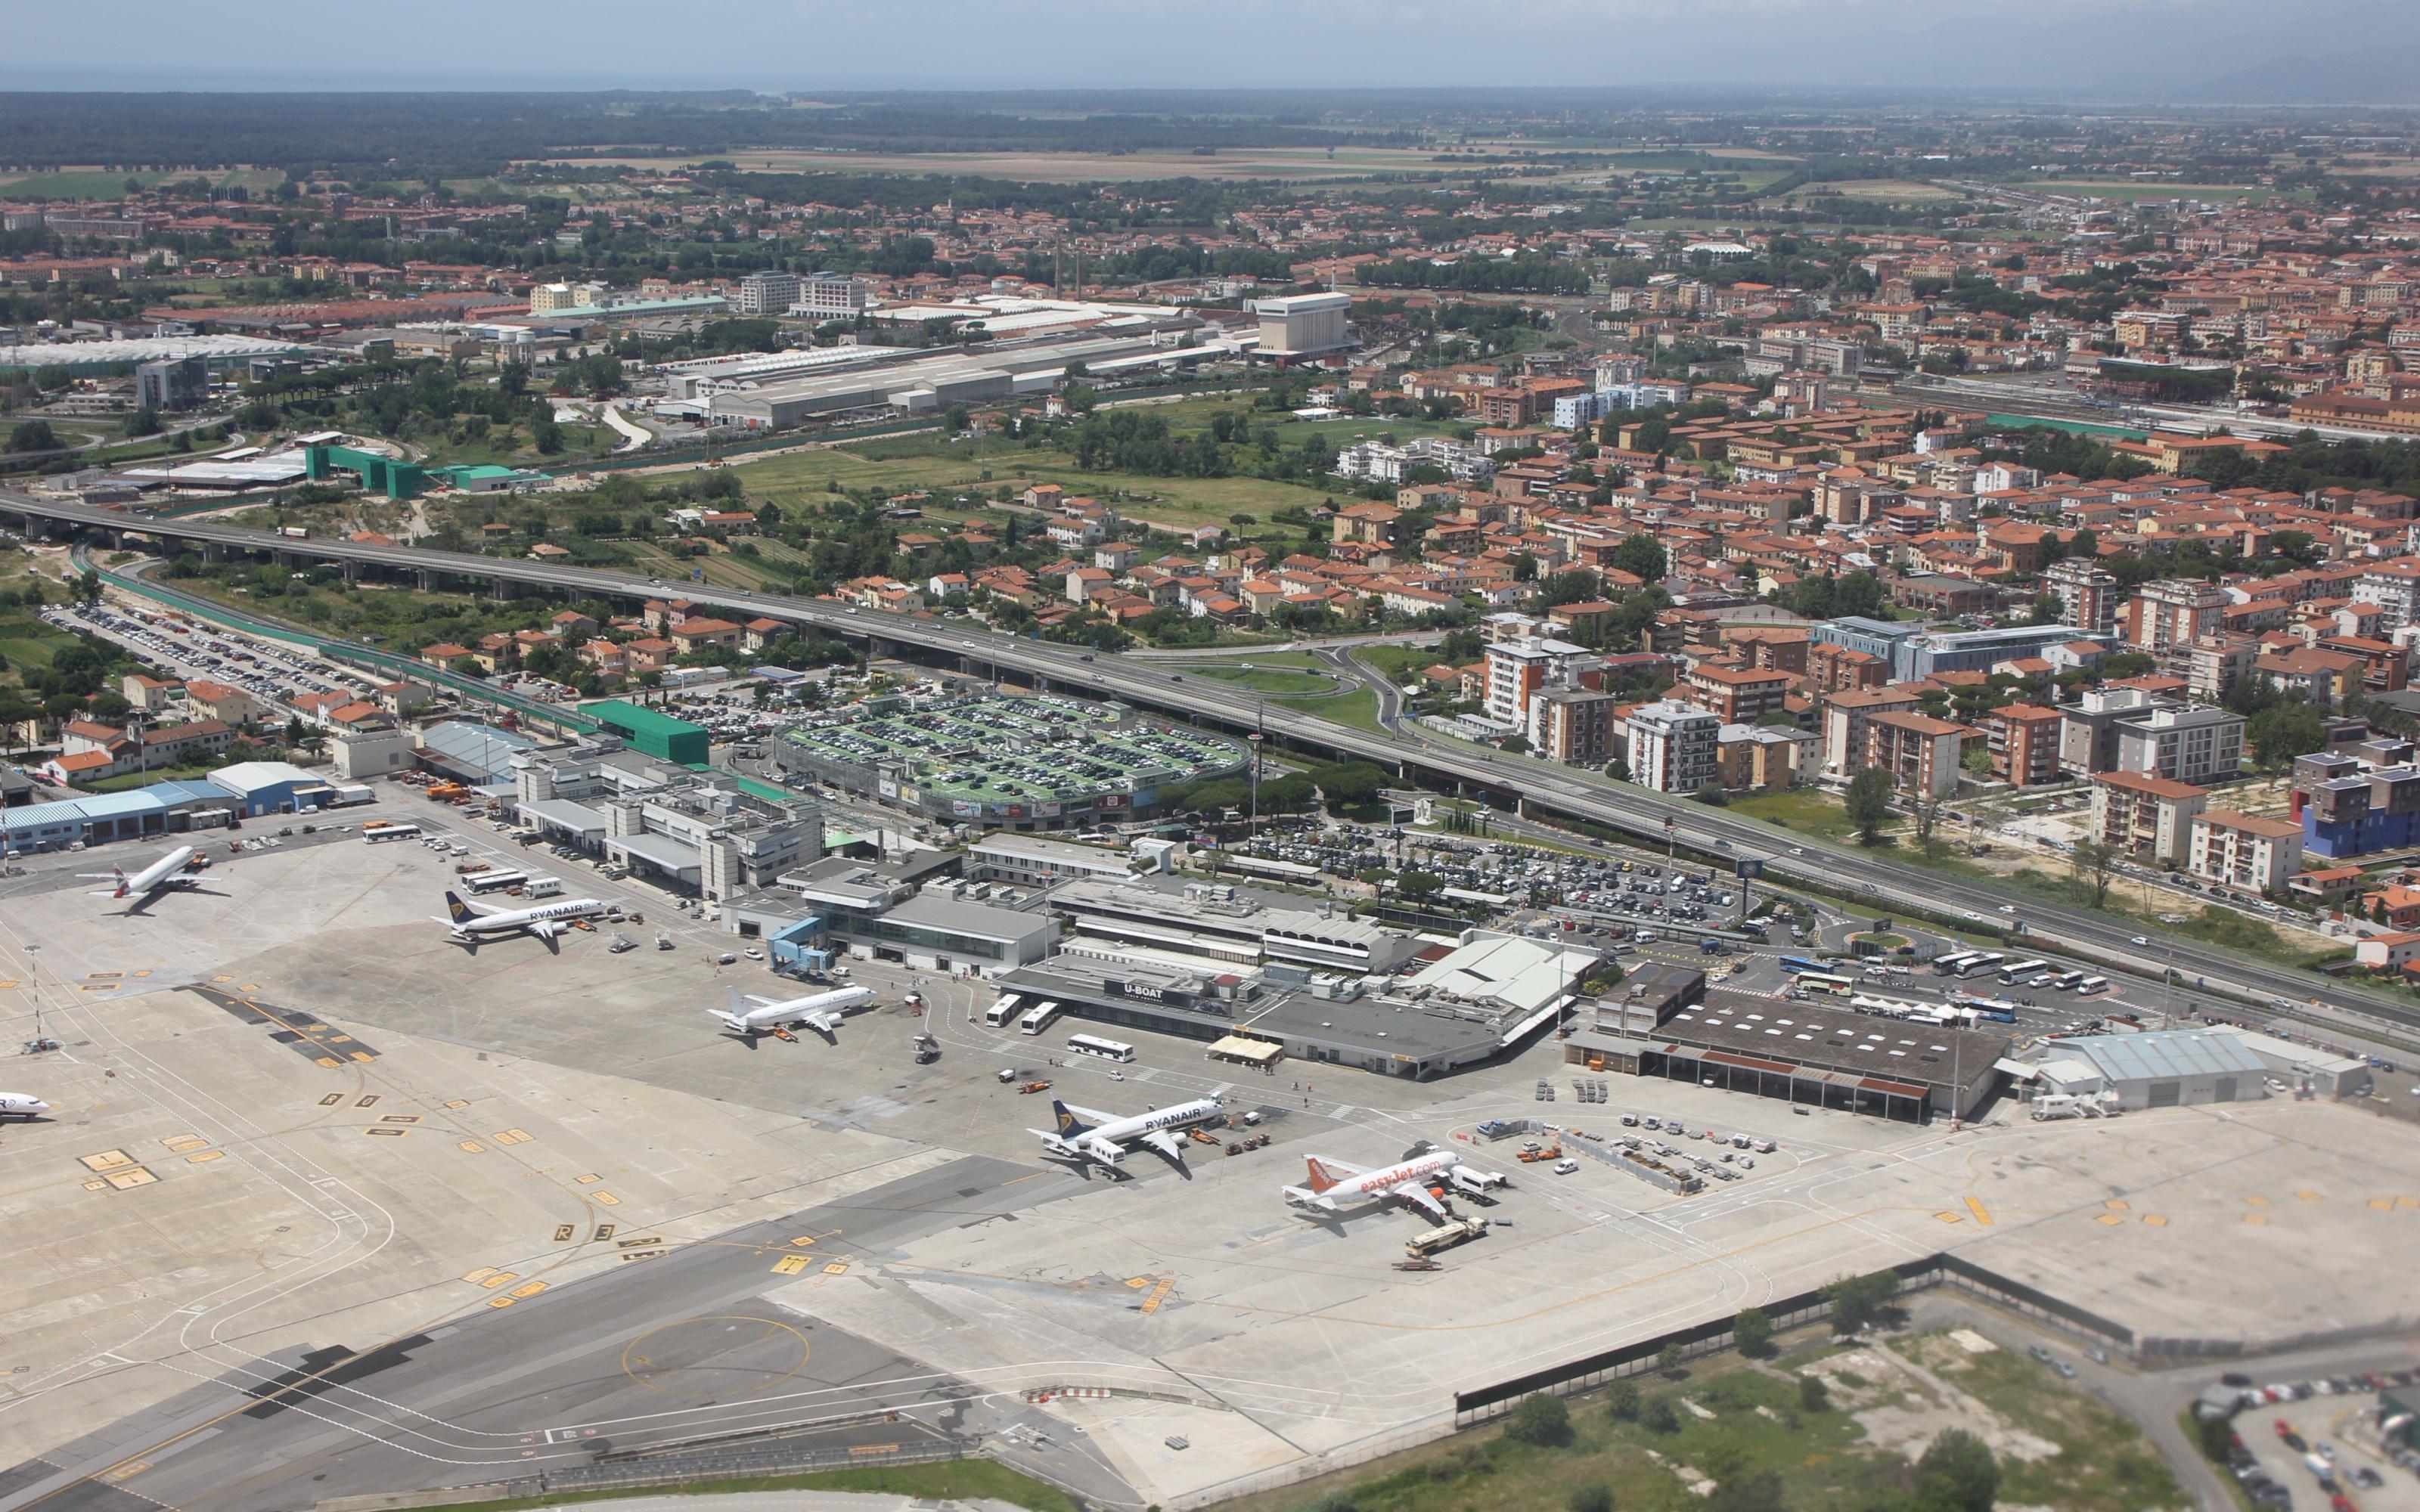 Aeroporto Pisa : Aeroporto di pisa san giusto wikipedia